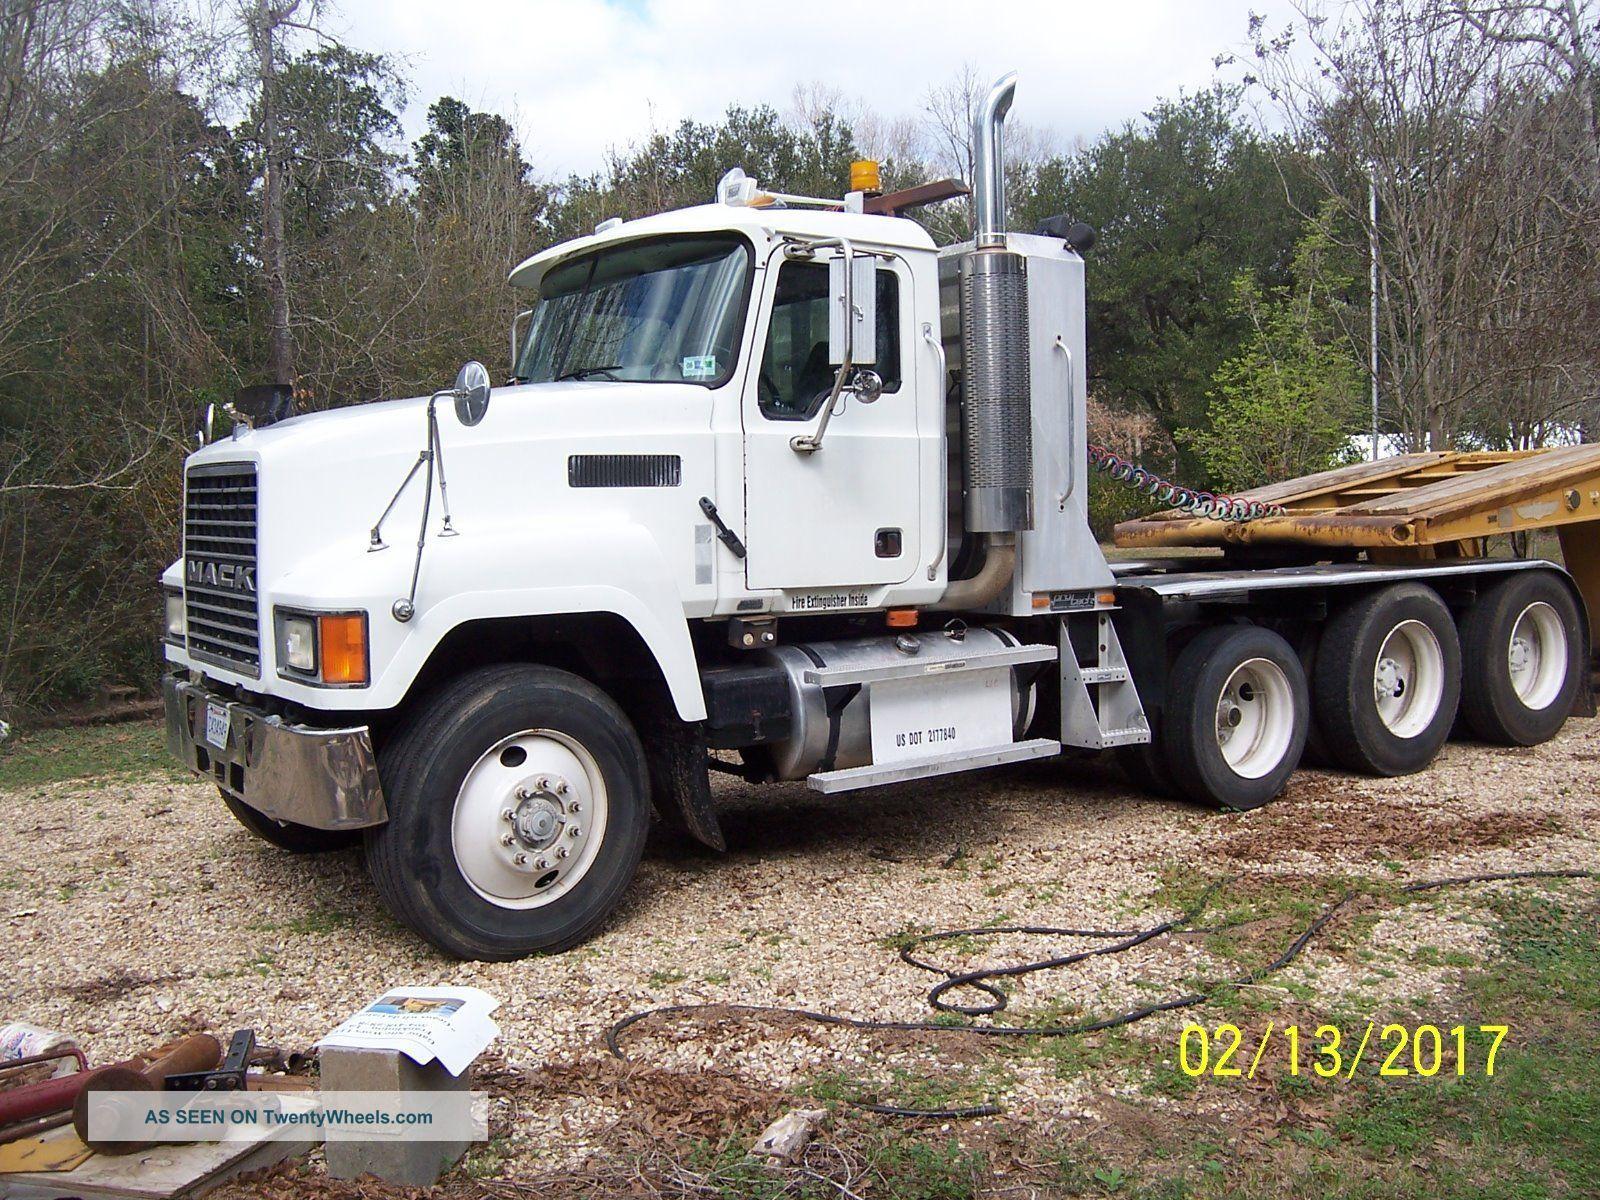 2004 Mack Other Heavy Duty Trucks photo